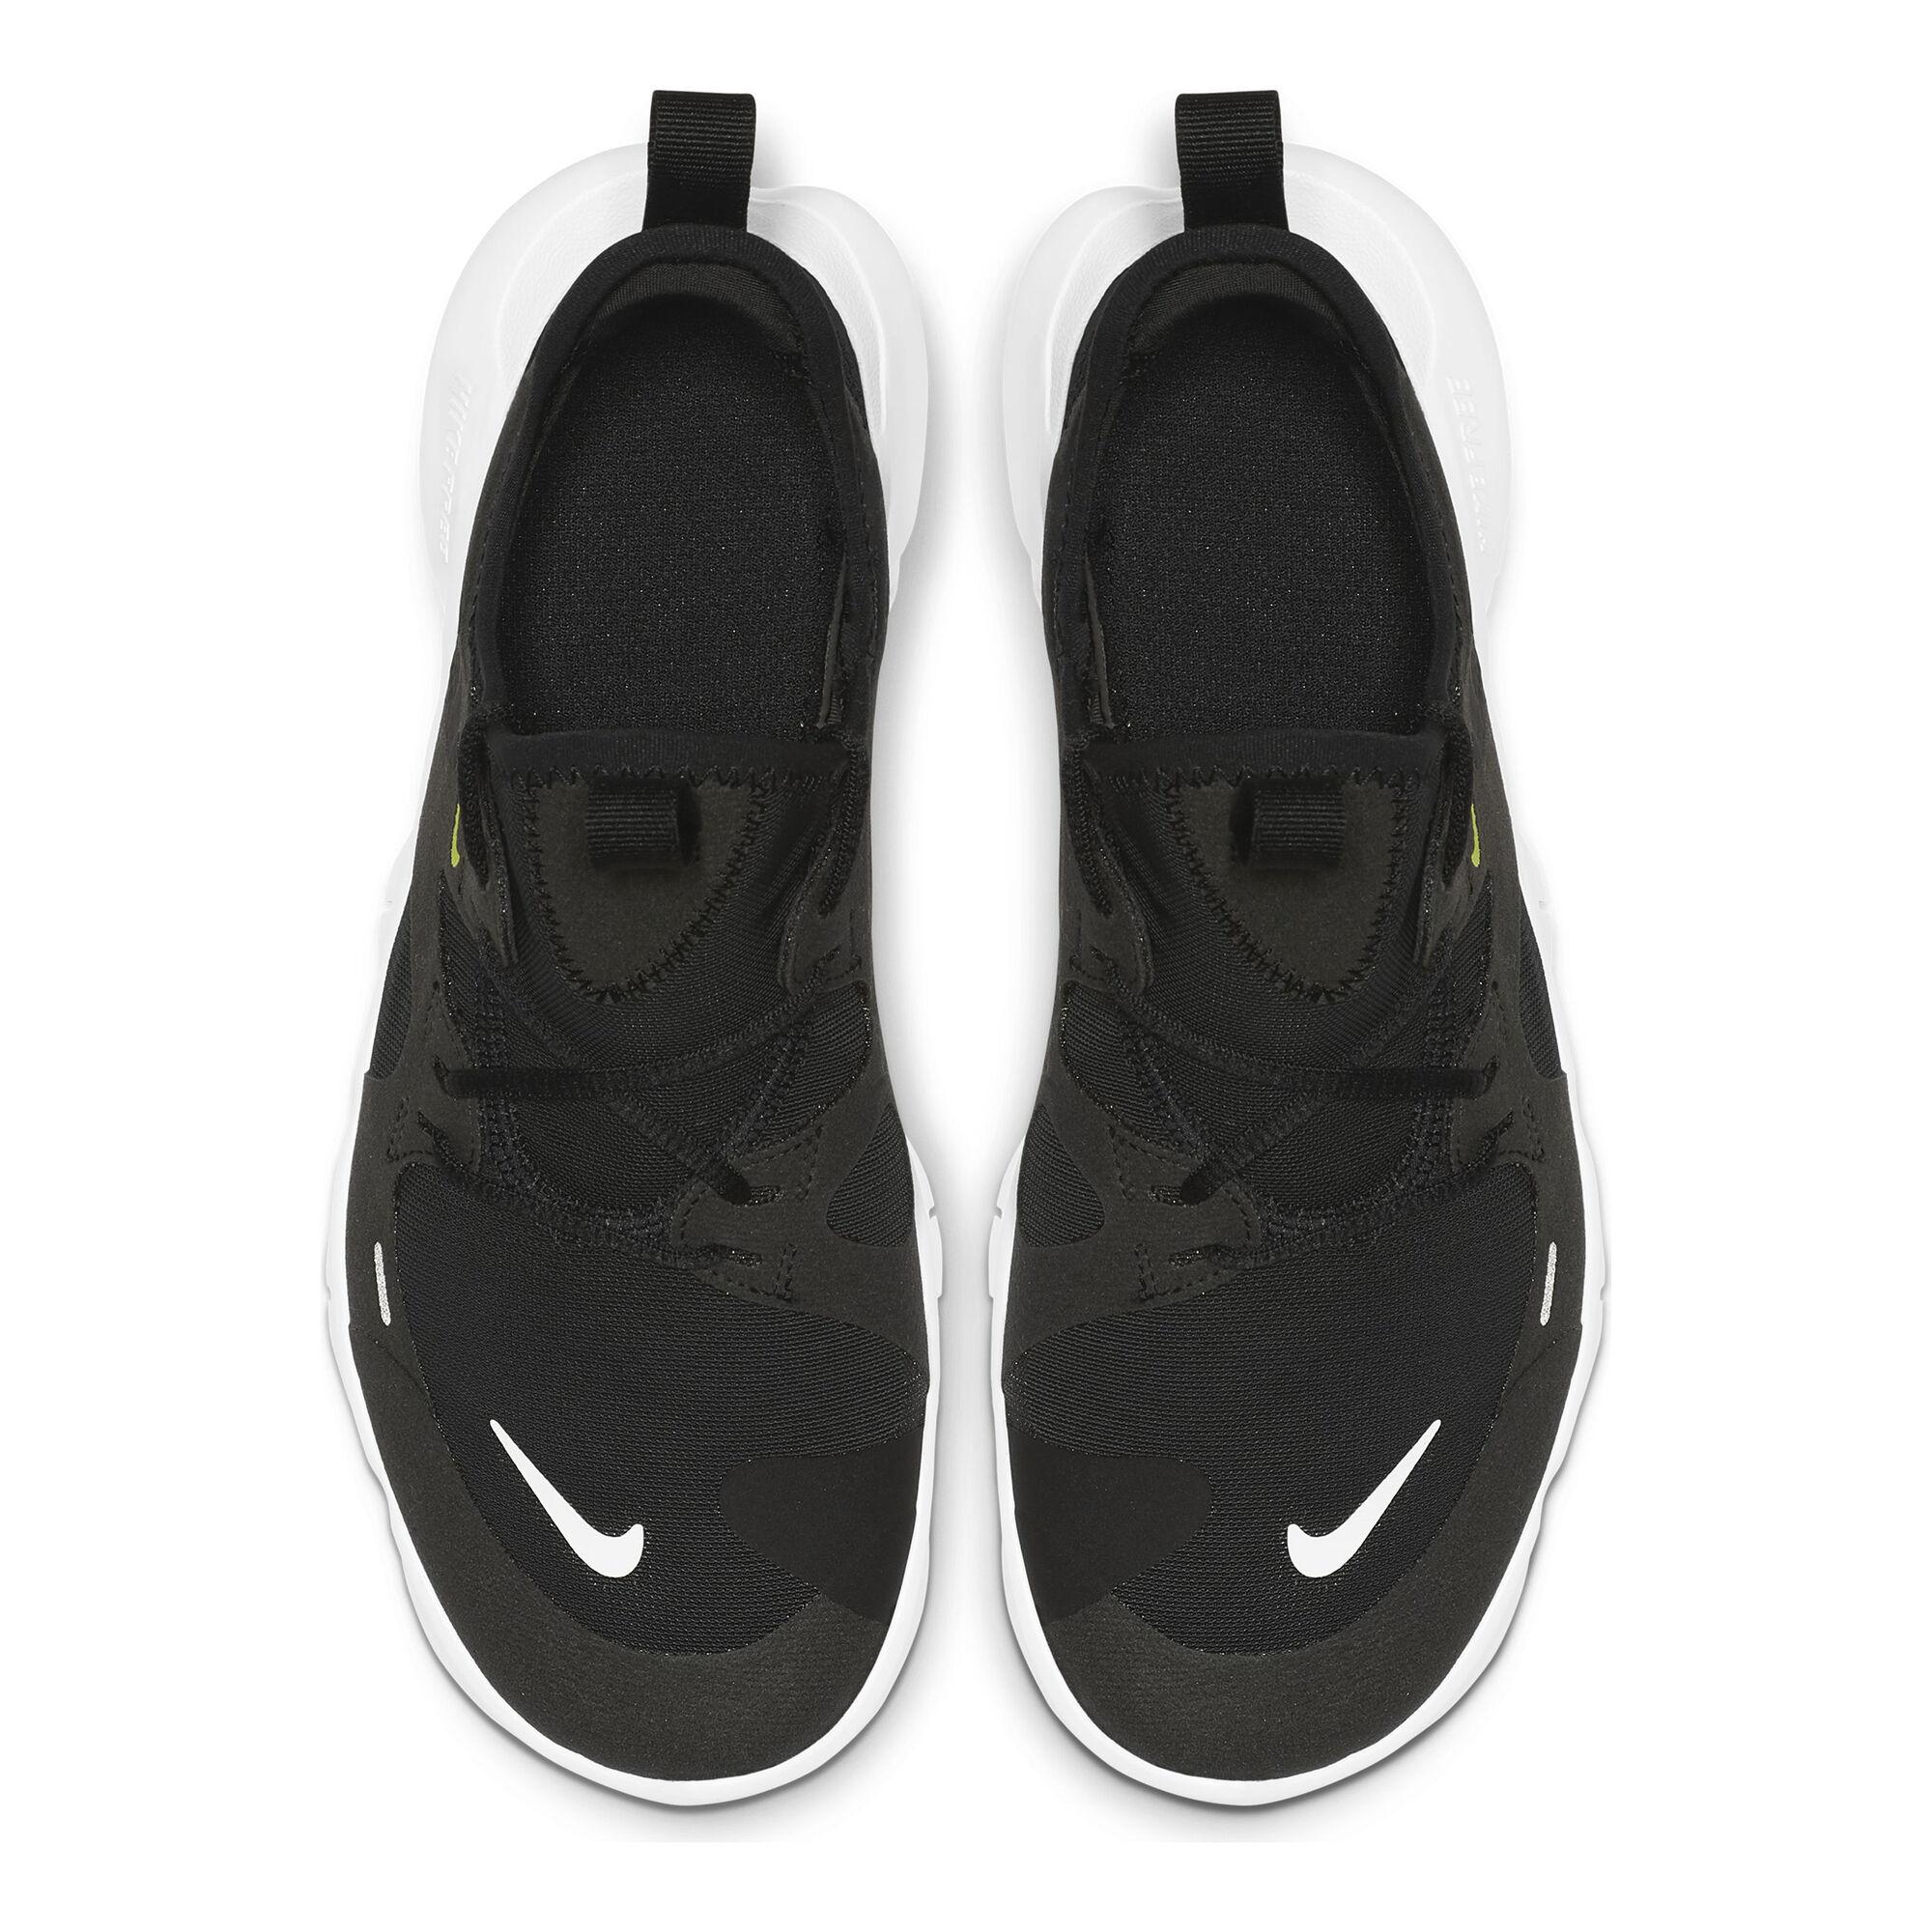 purchase cheap d26d6 9c370 buy Nike Free Run 5.0 Neutral Running Shoe Kids - Black ...